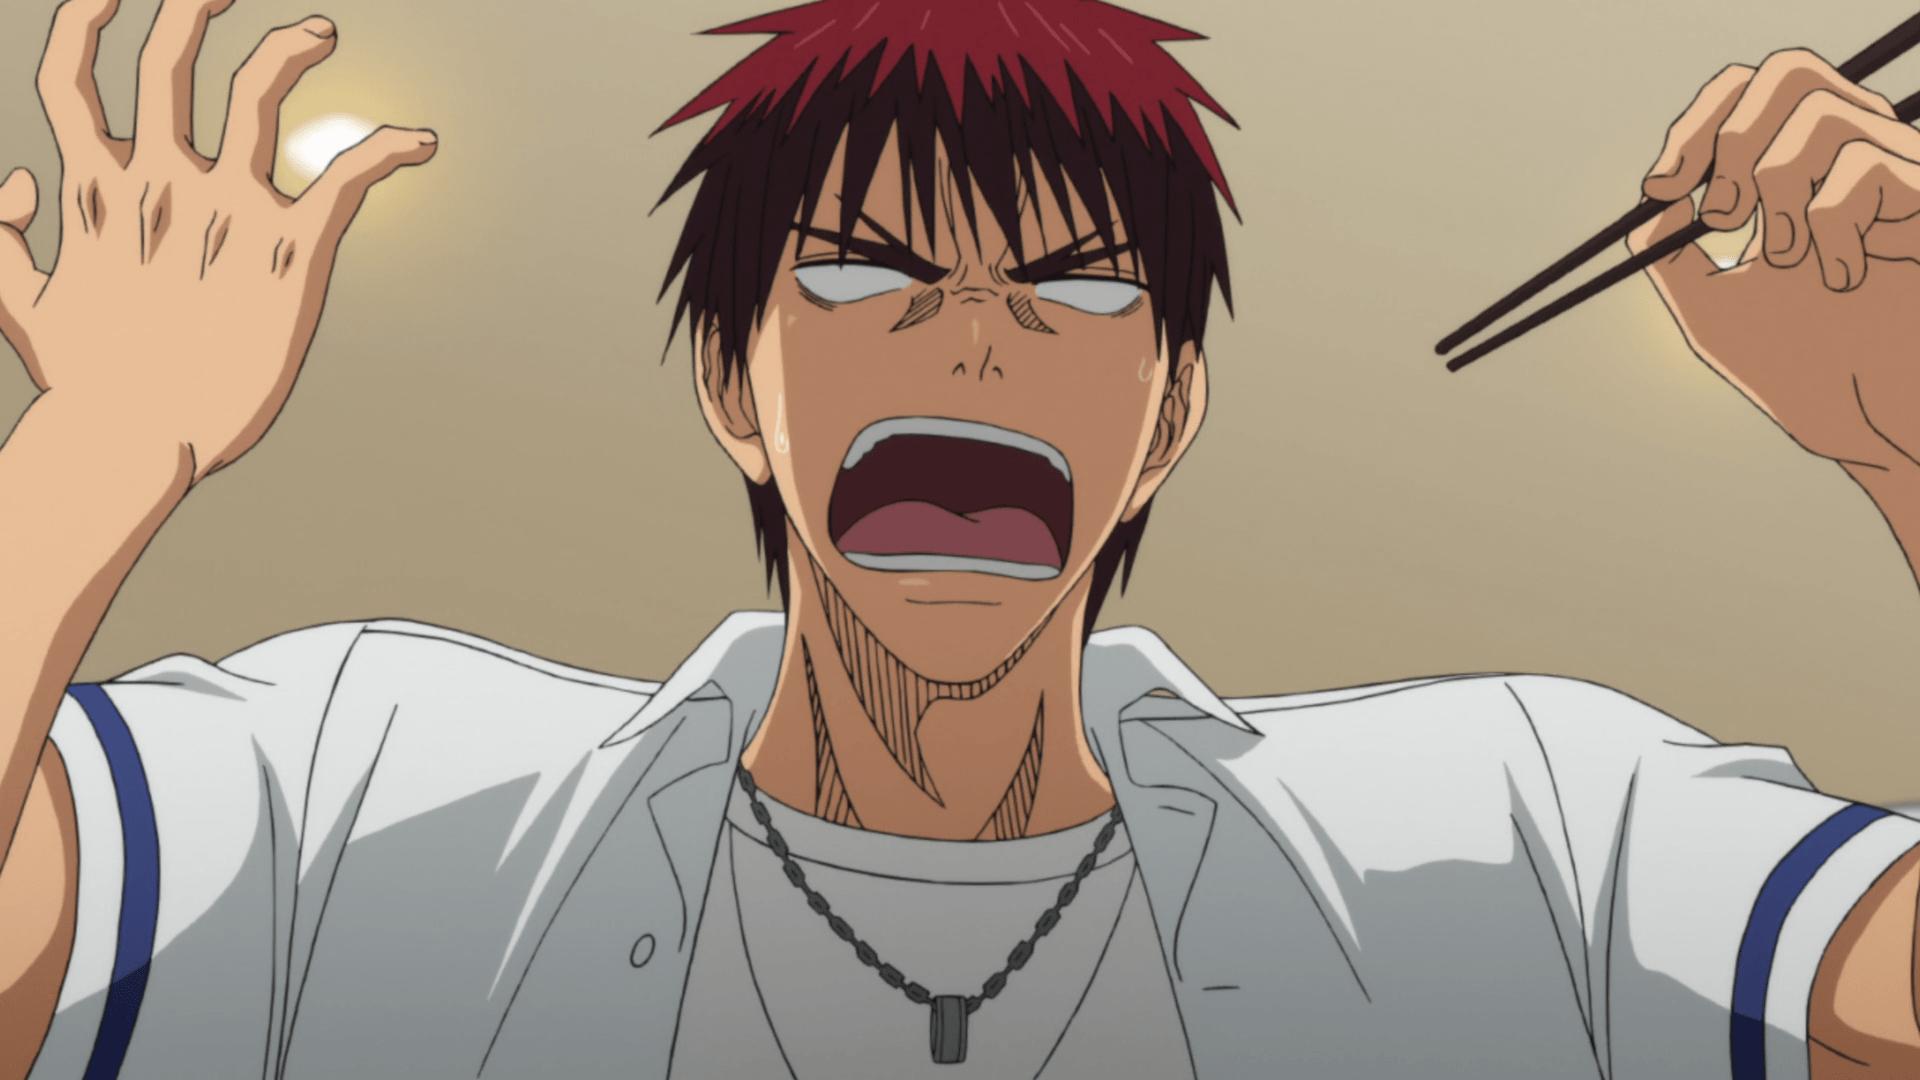 [Saizen]_Kuroko's_Basketball_Bloopers_S2_Vol_1_[1080p][4FF29DC3]_001_332